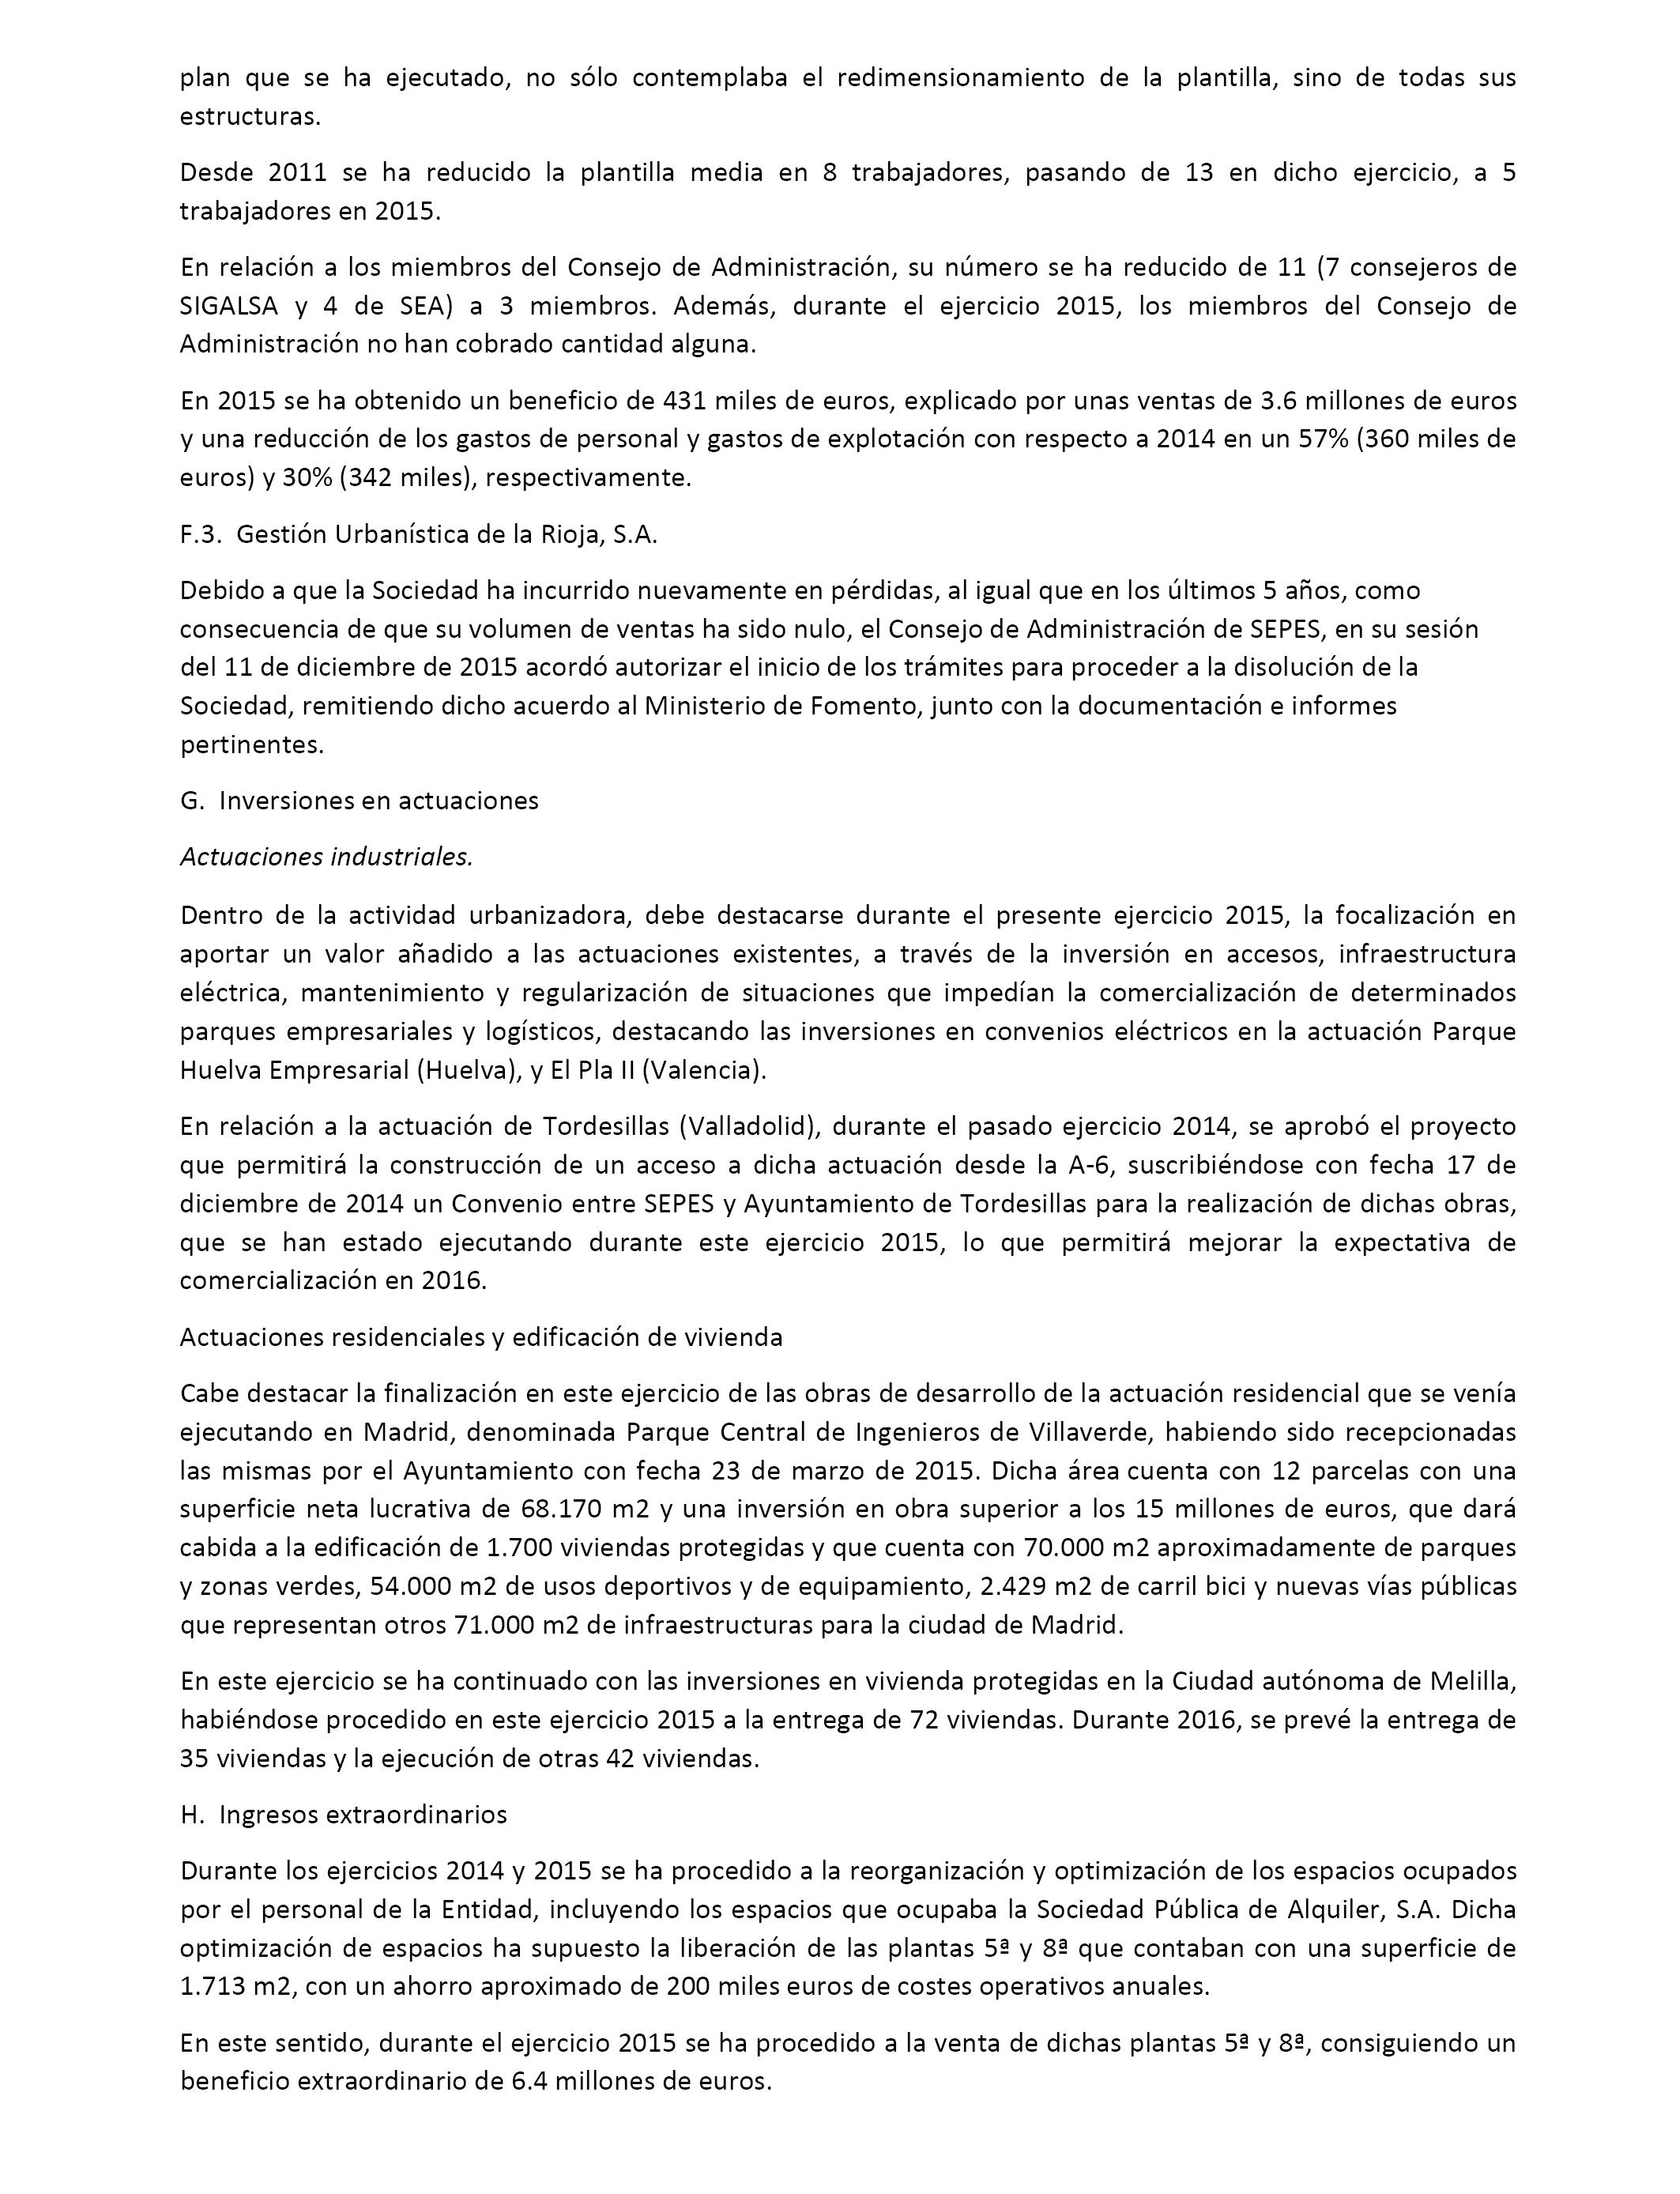 BOE.es - Documento BOE-A-2016-10448